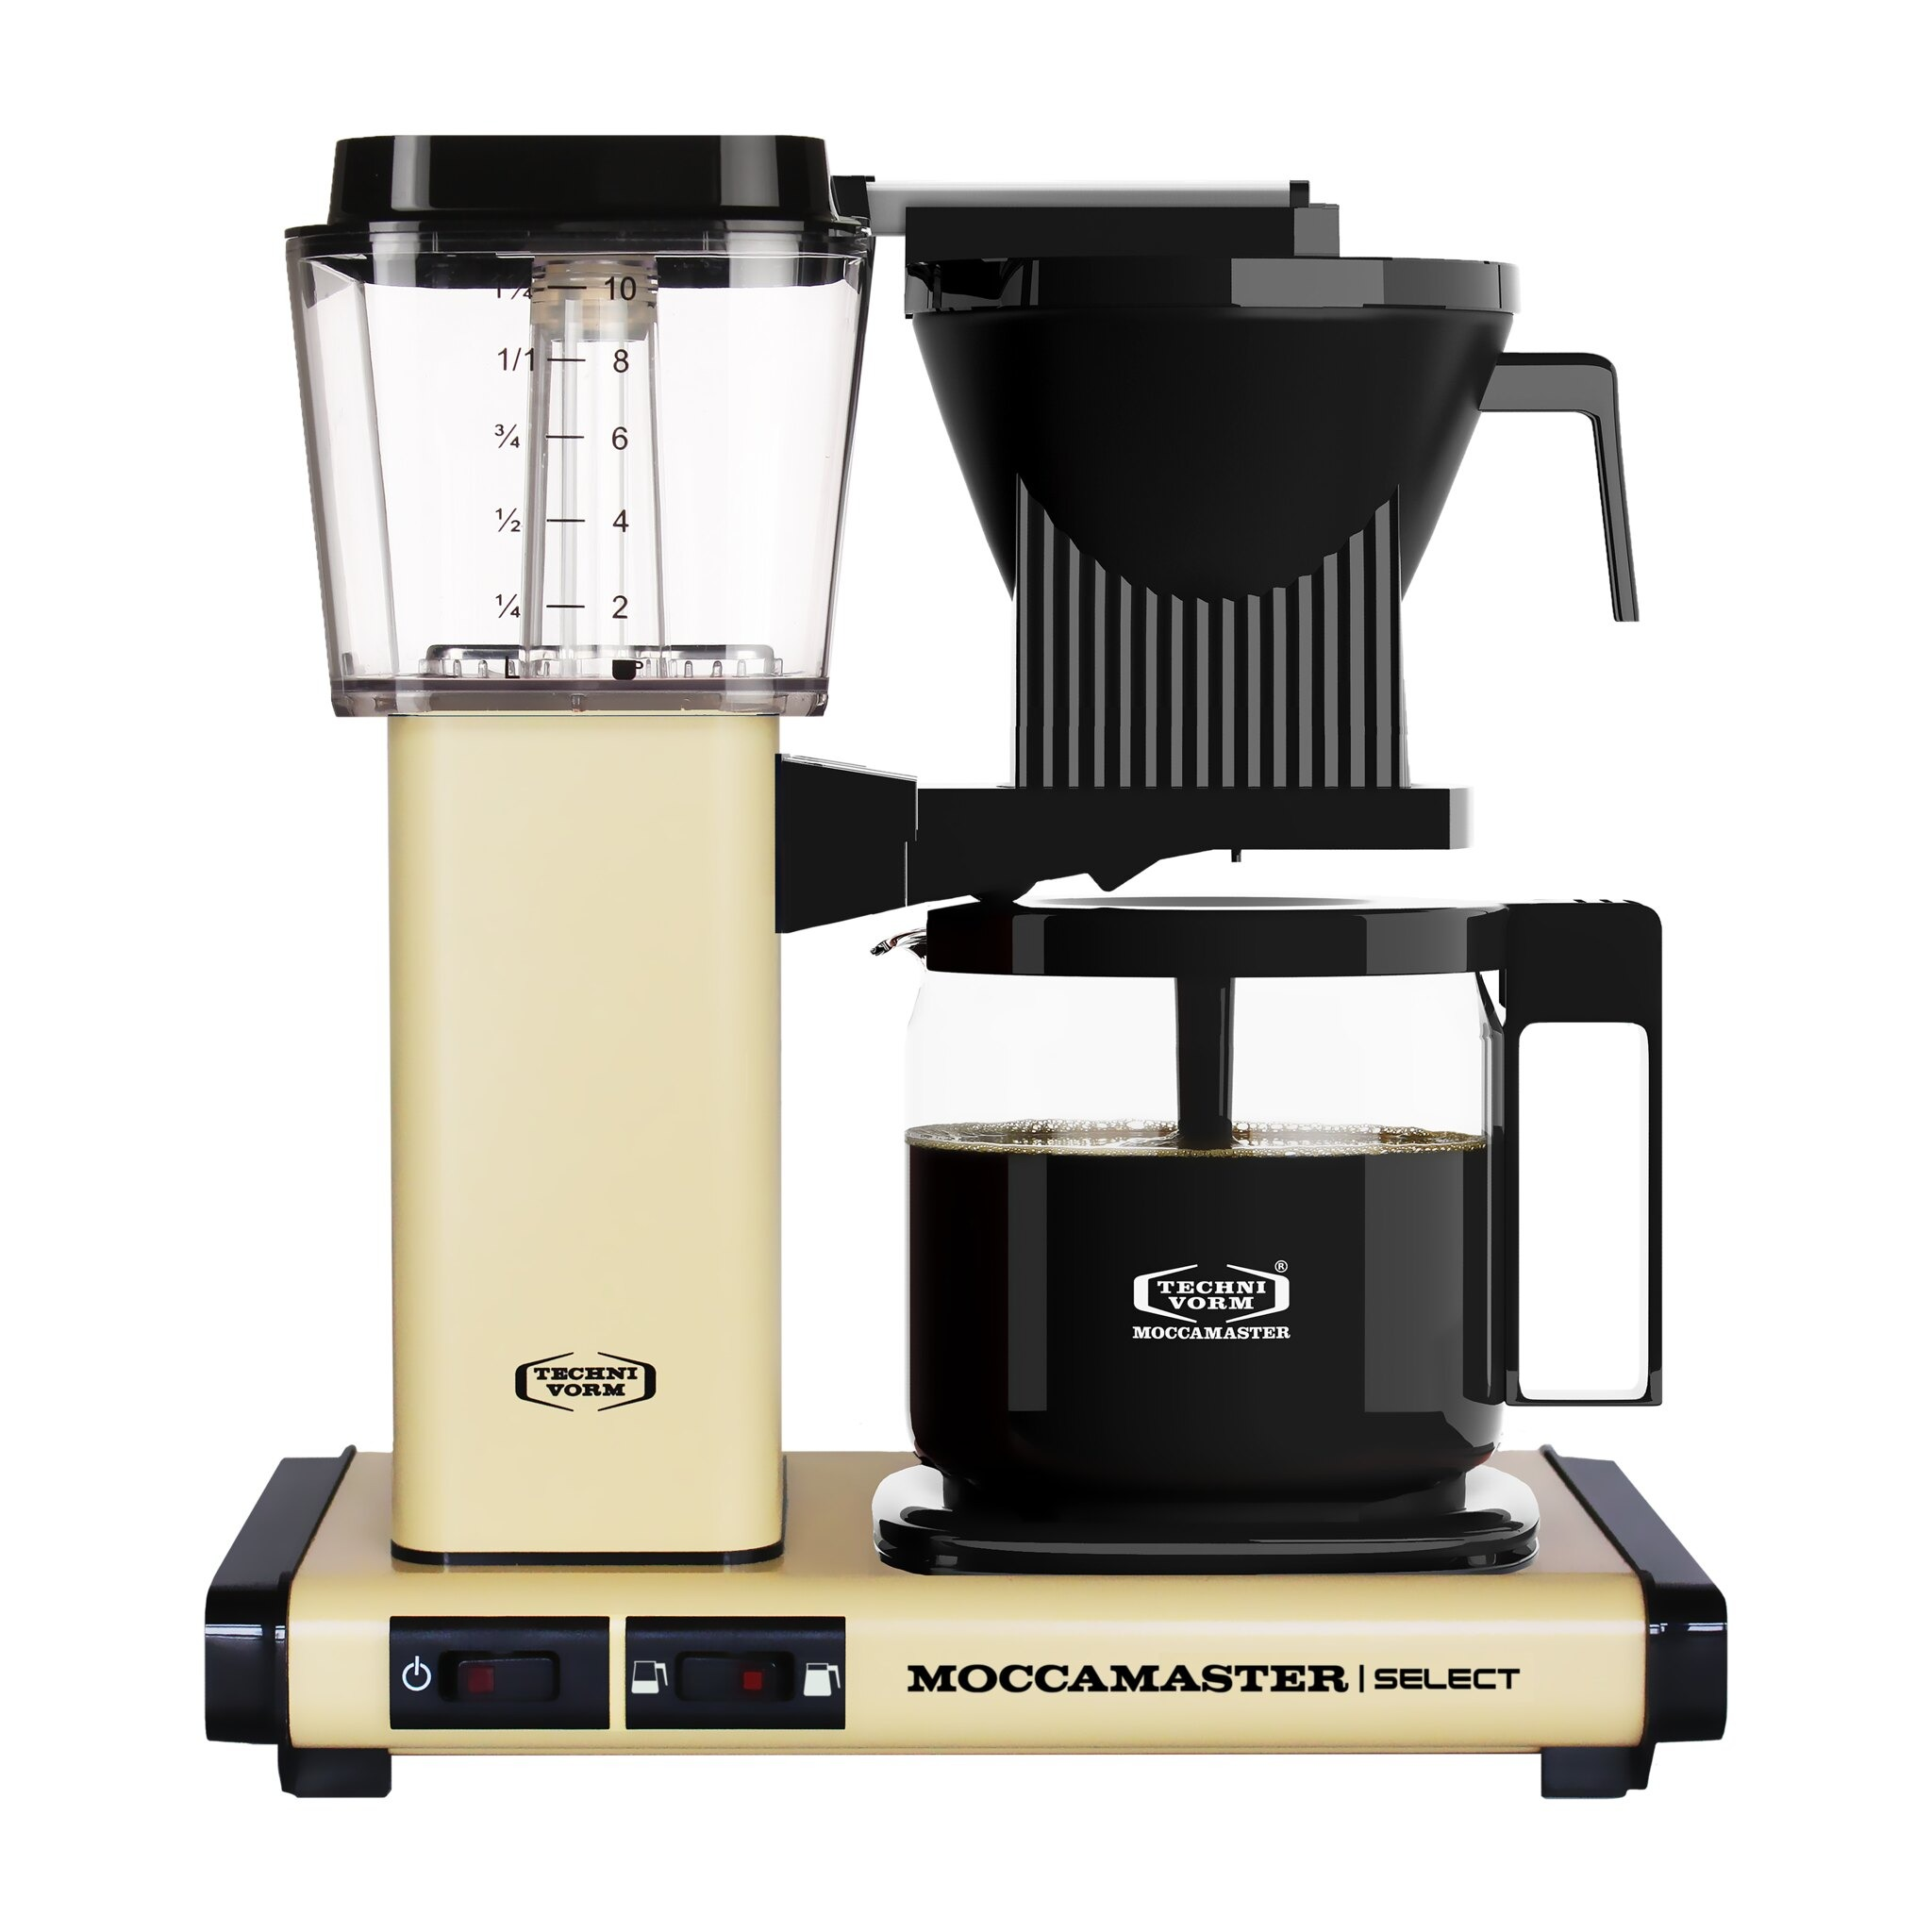 Moccamaster koffiefilter apparaat KBG SELECT pastelgeel